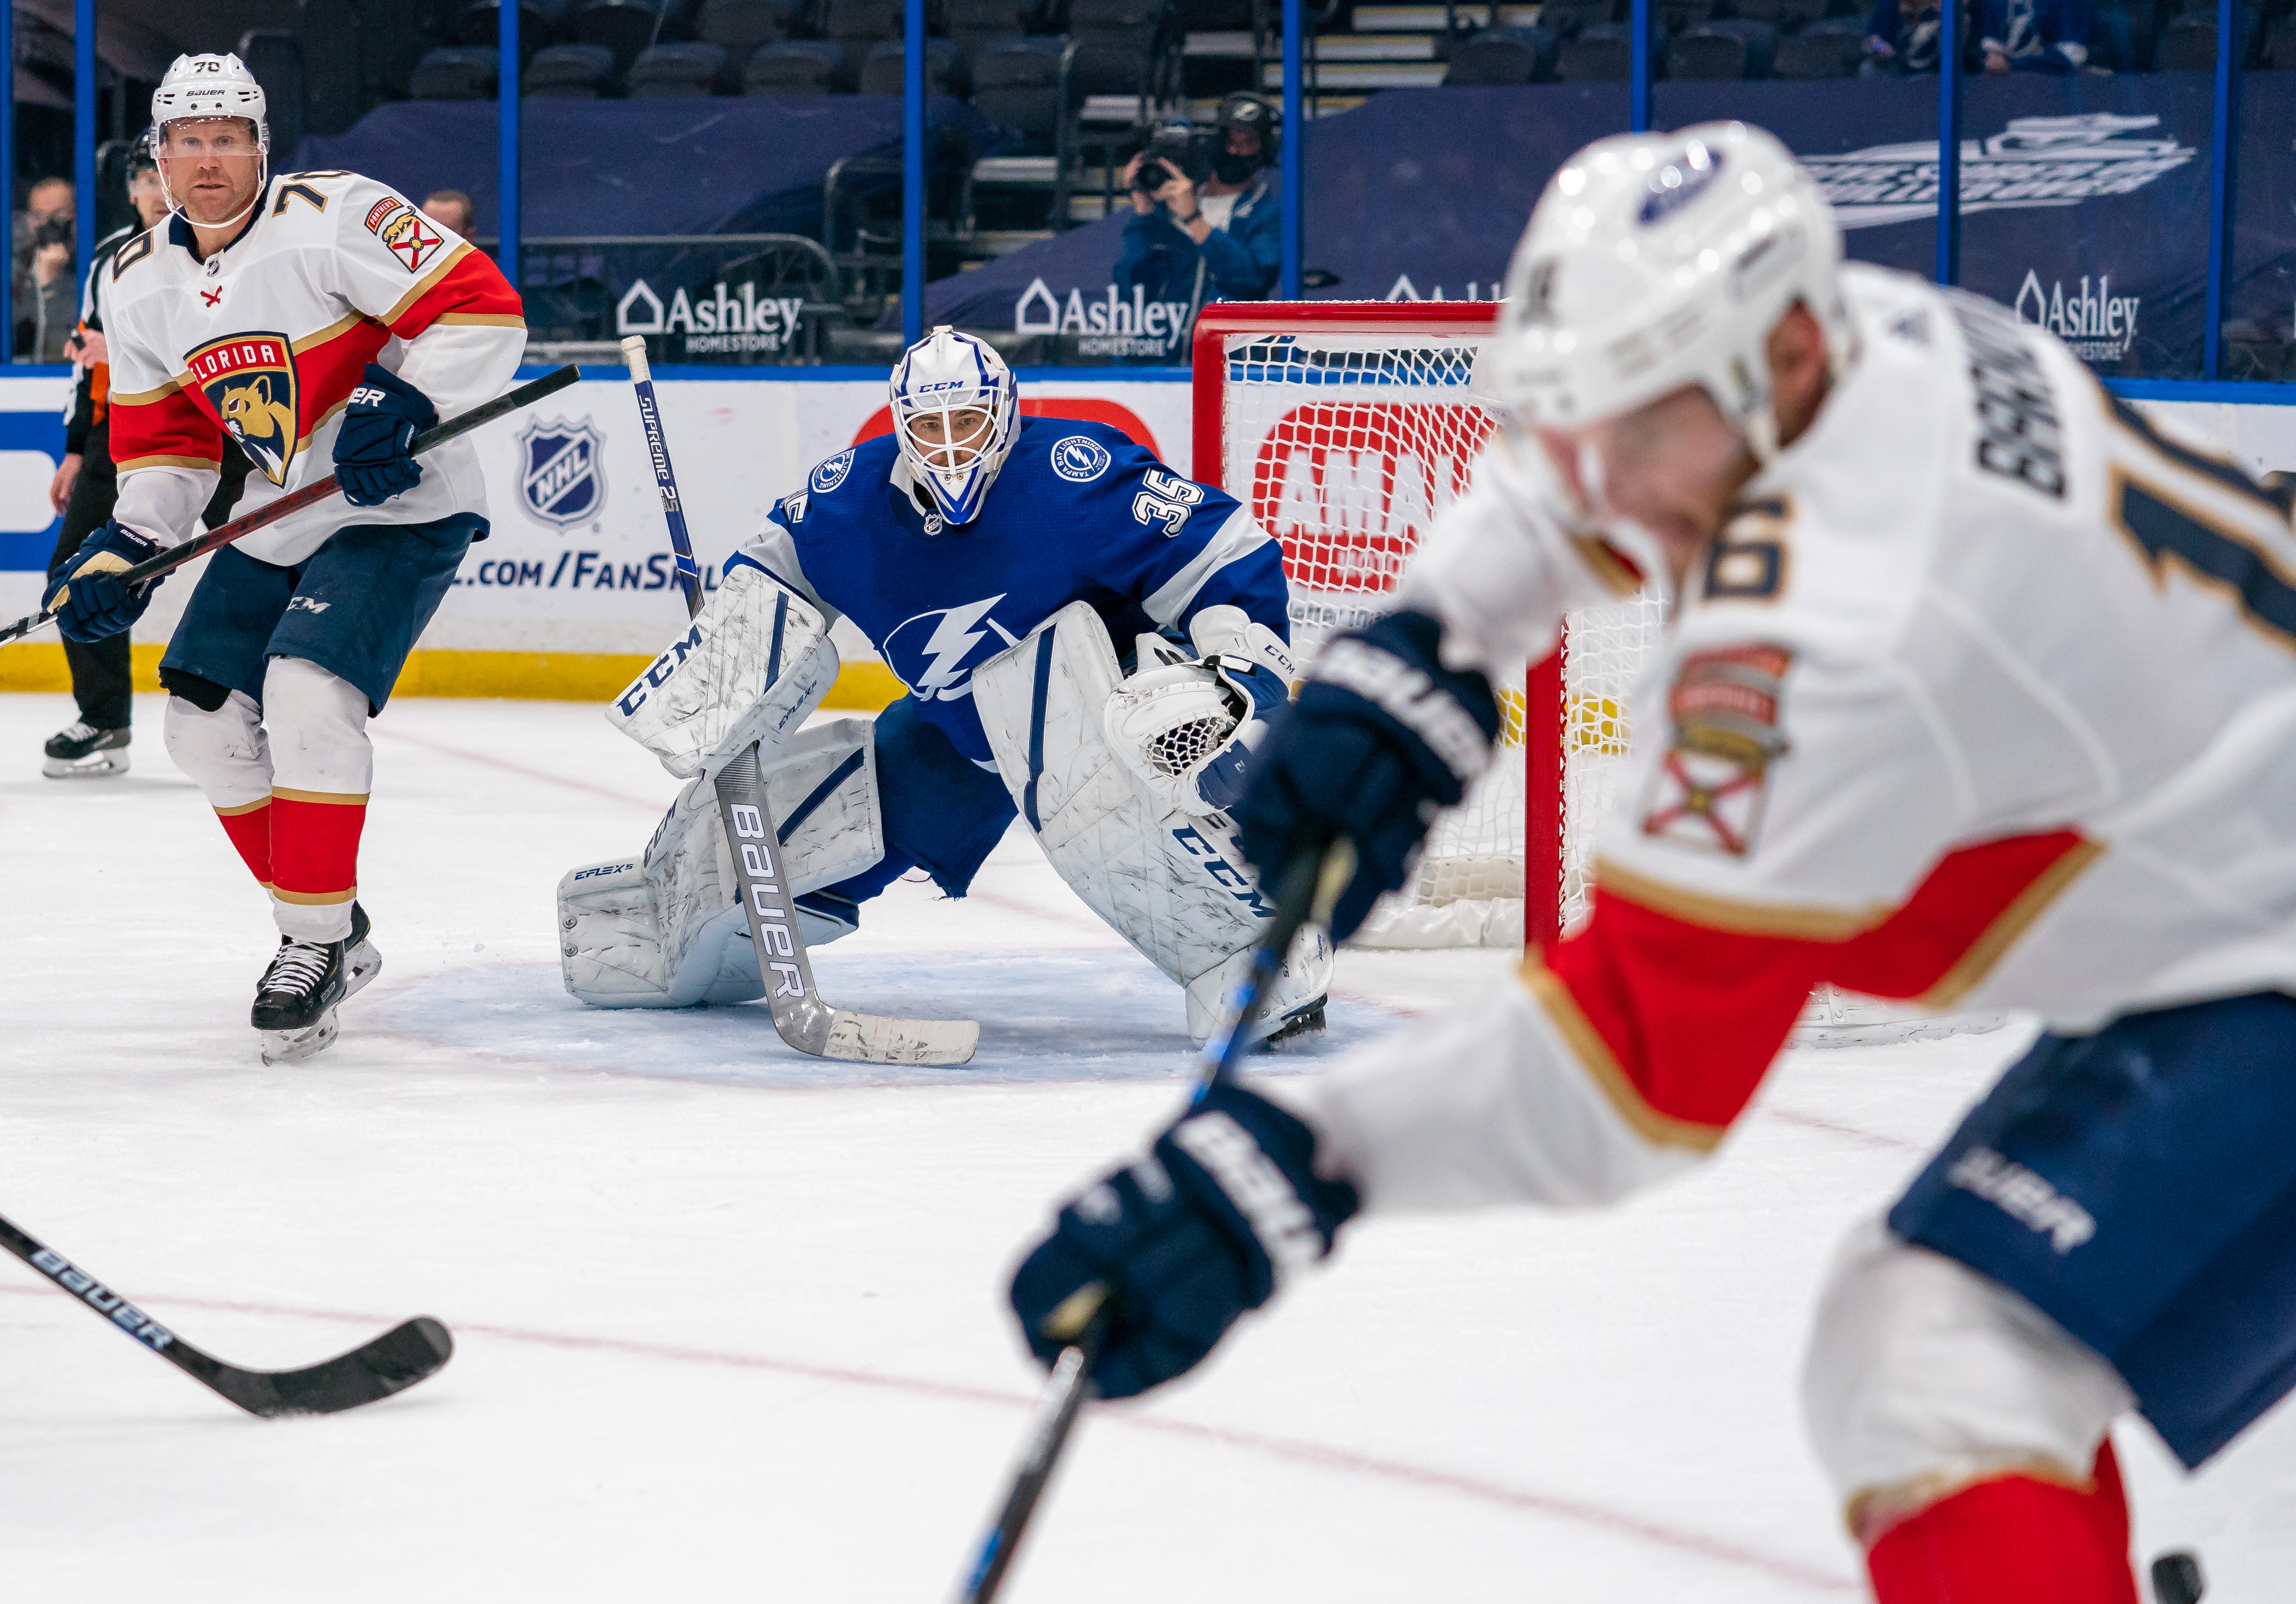 NHL: MAR 21 Panthers at Lightning